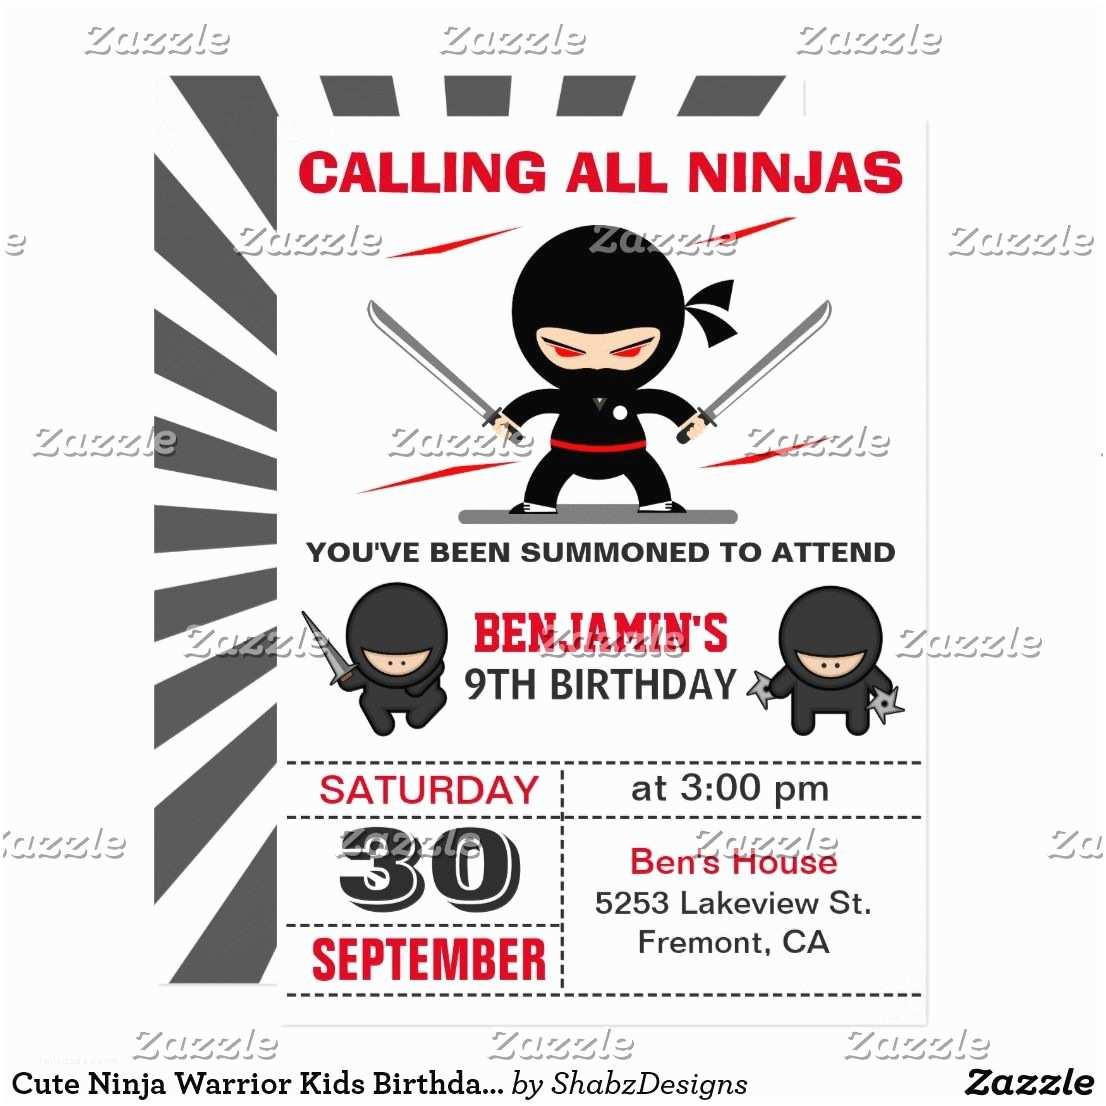 Ninja Party Invitations Cute Ninja Warrior Kids Birthday Party Invitation